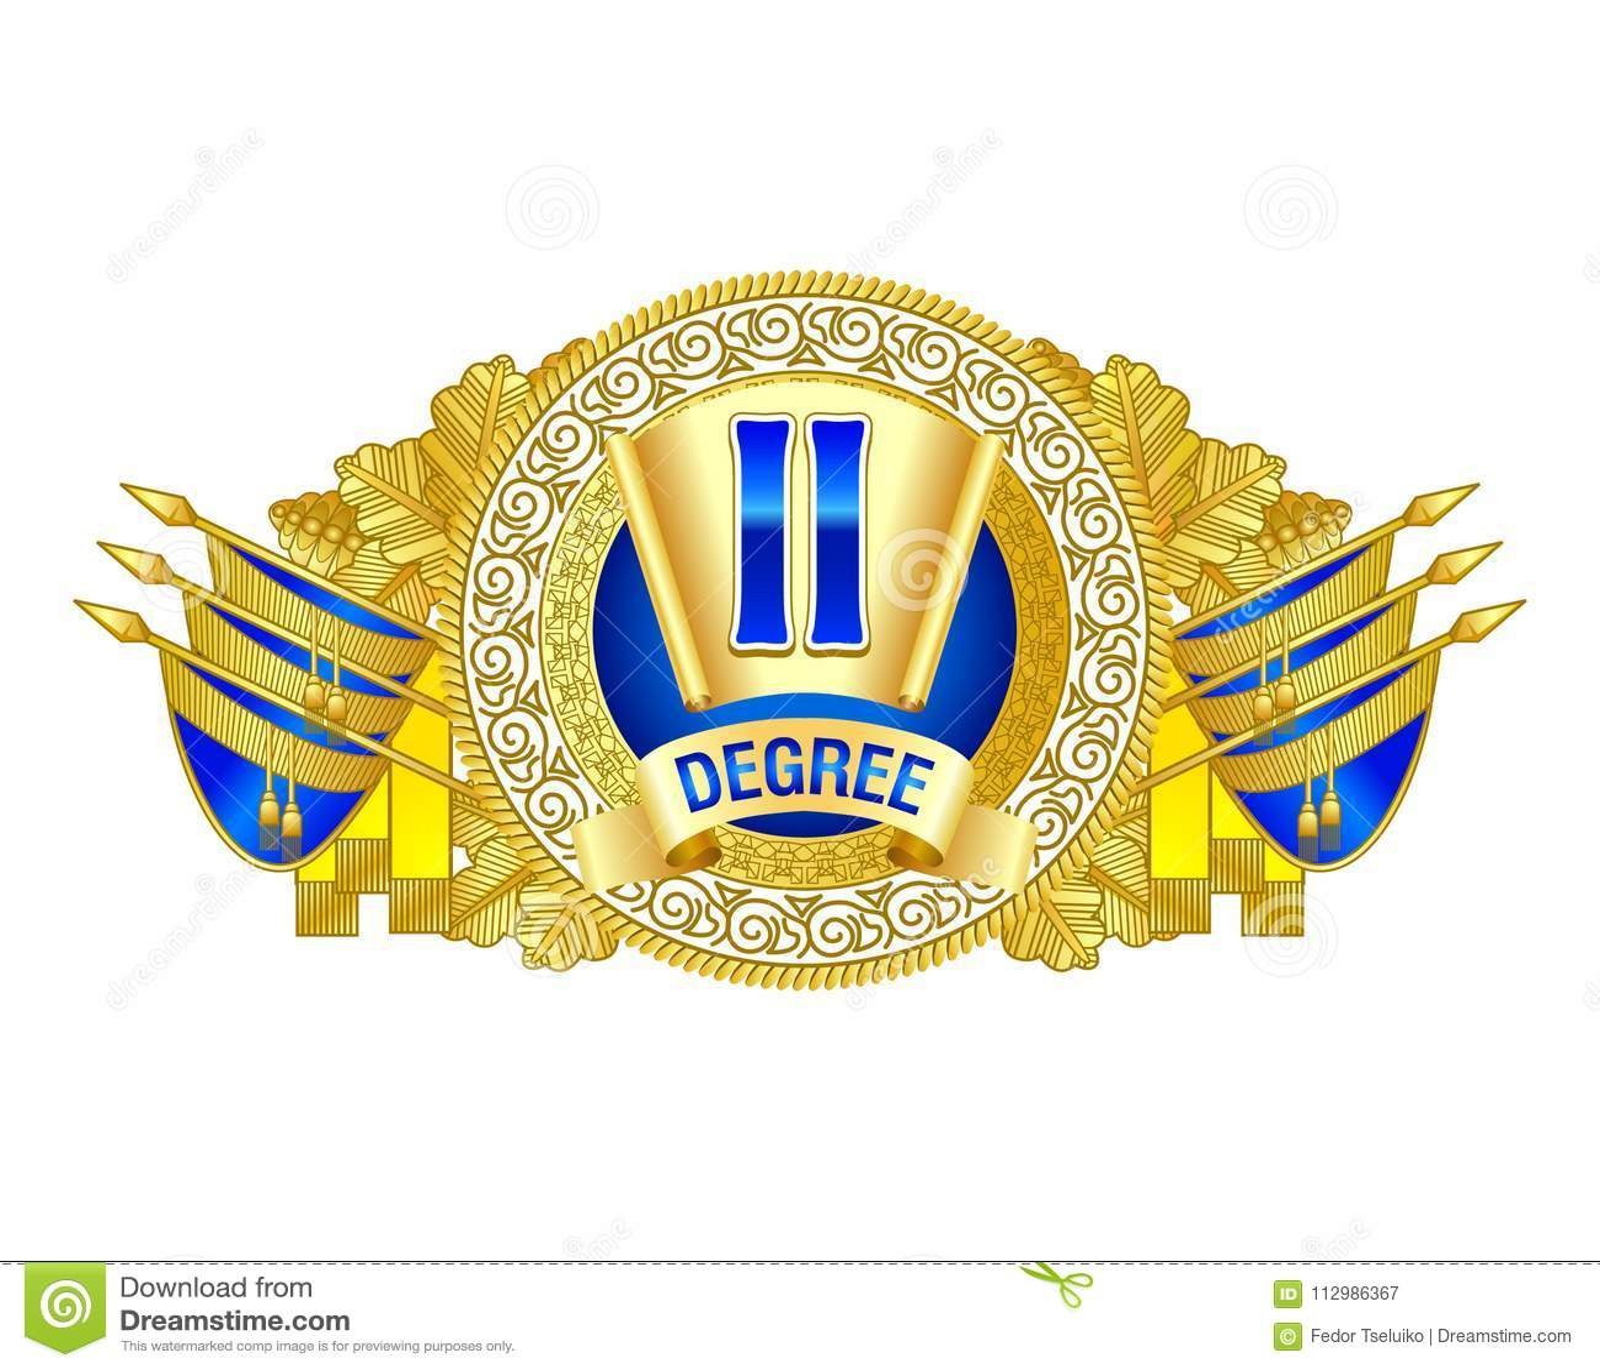 Heraldic decorative label of second degree.